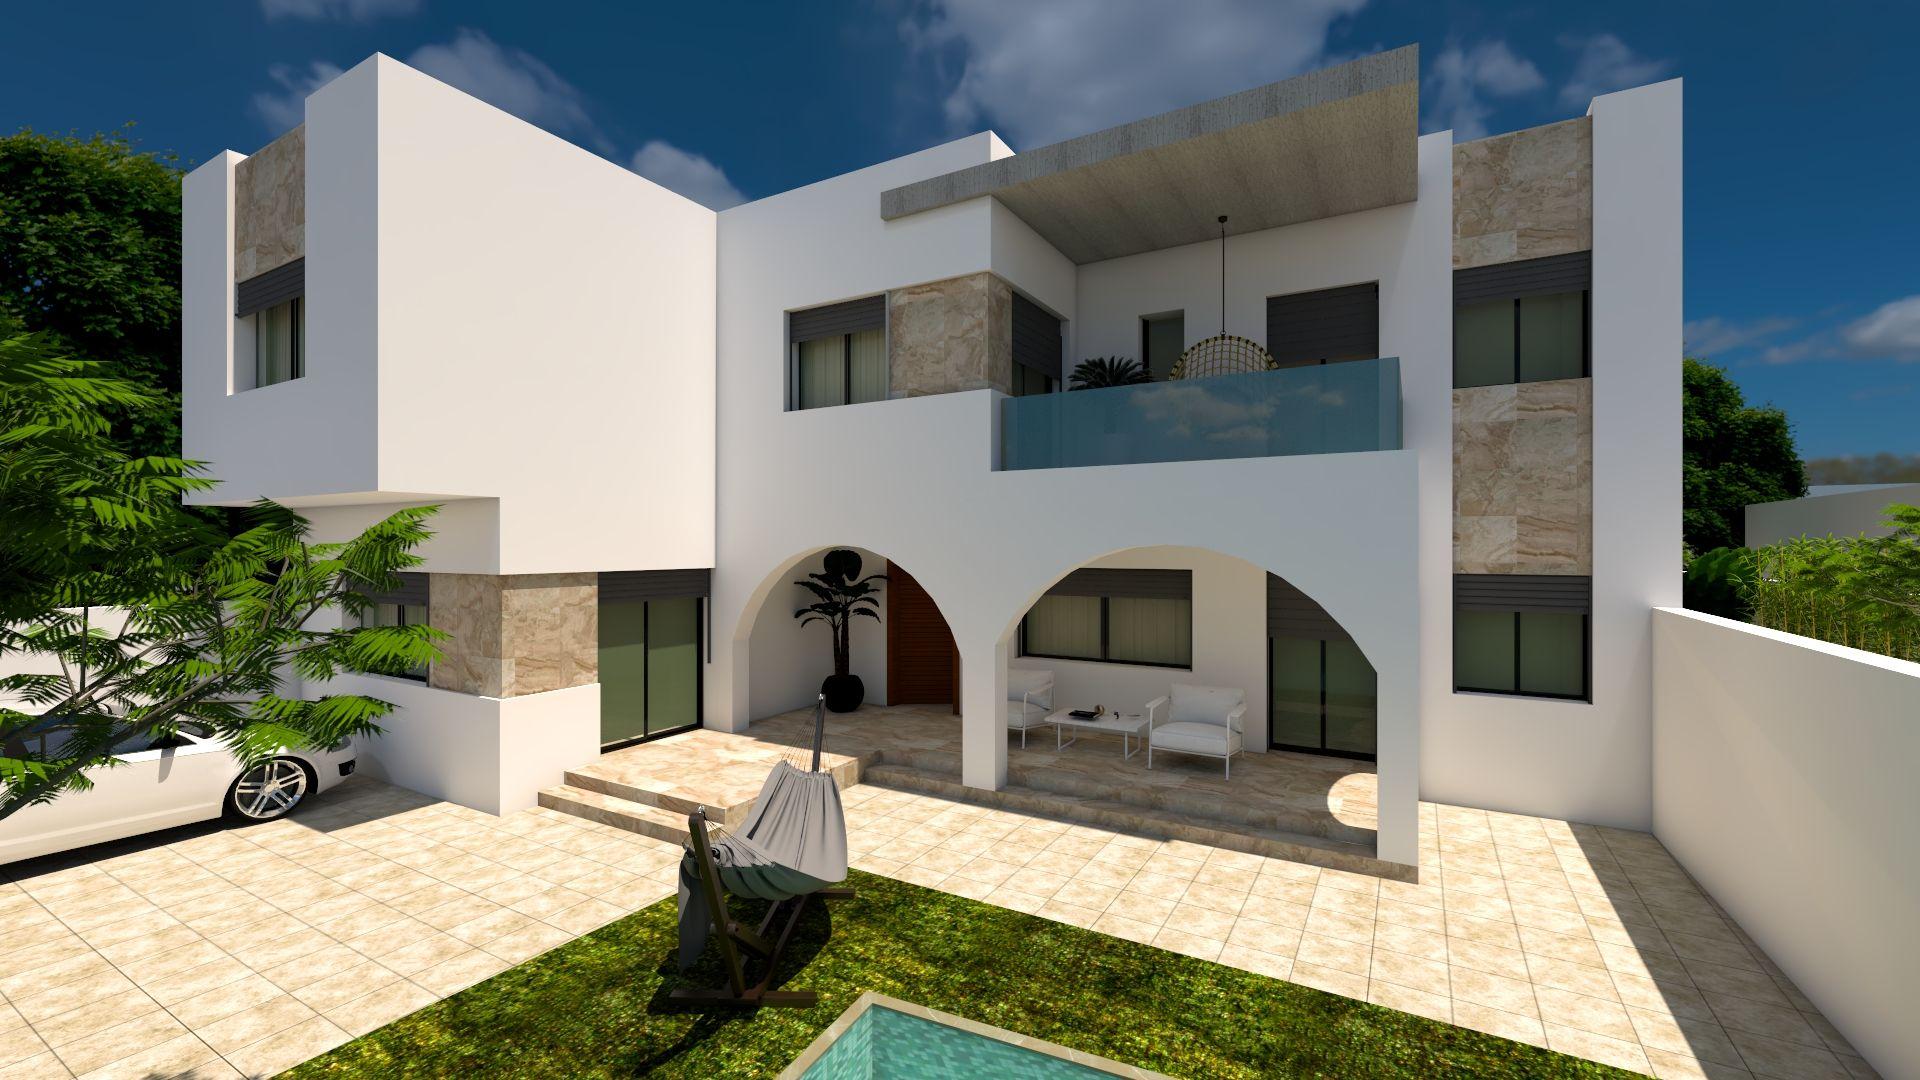 Av une belle villa à hammamet nord marwwa